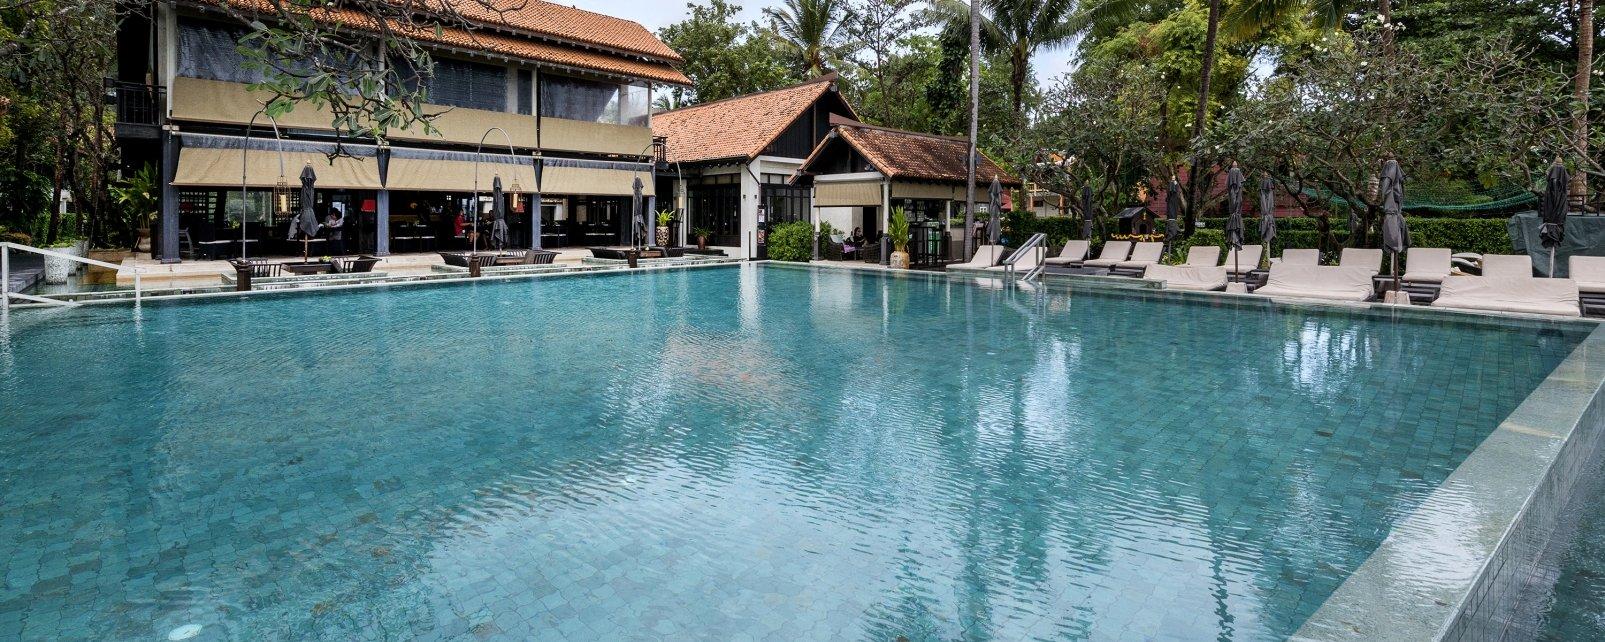 Hôtel Le Méridien Koh Samui Resort & Spa